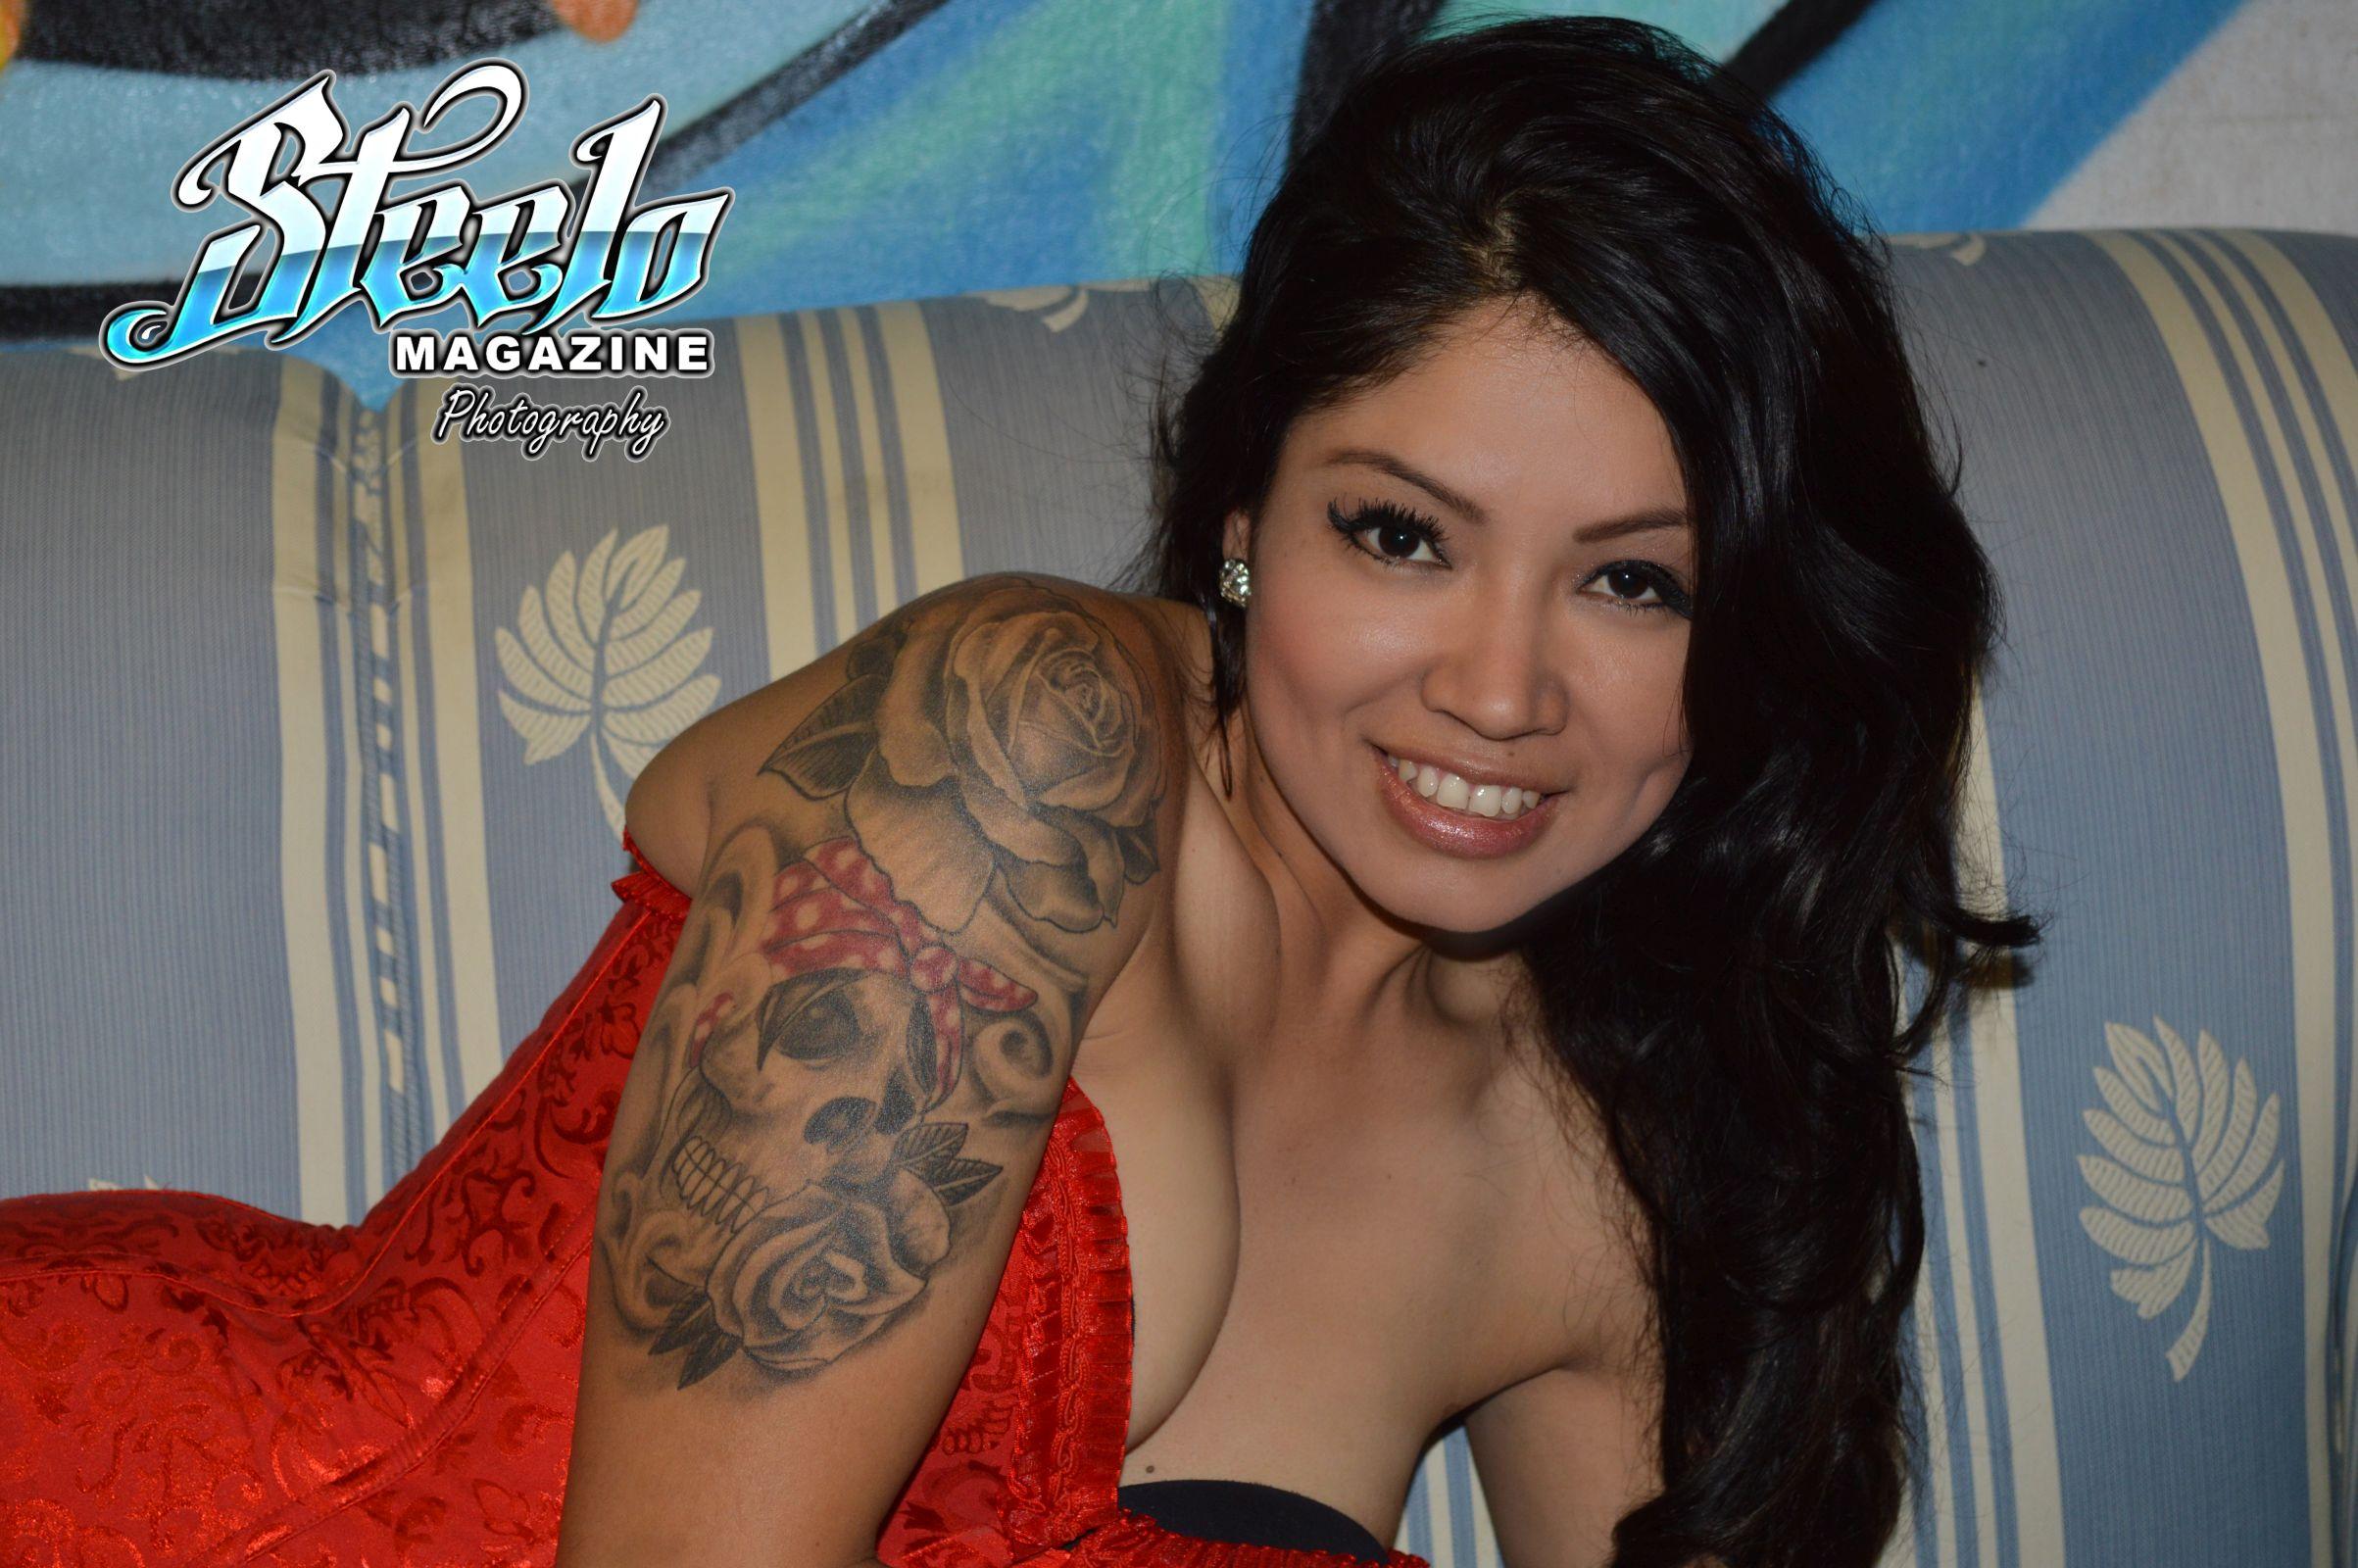 Jeannette Bday Pics 24